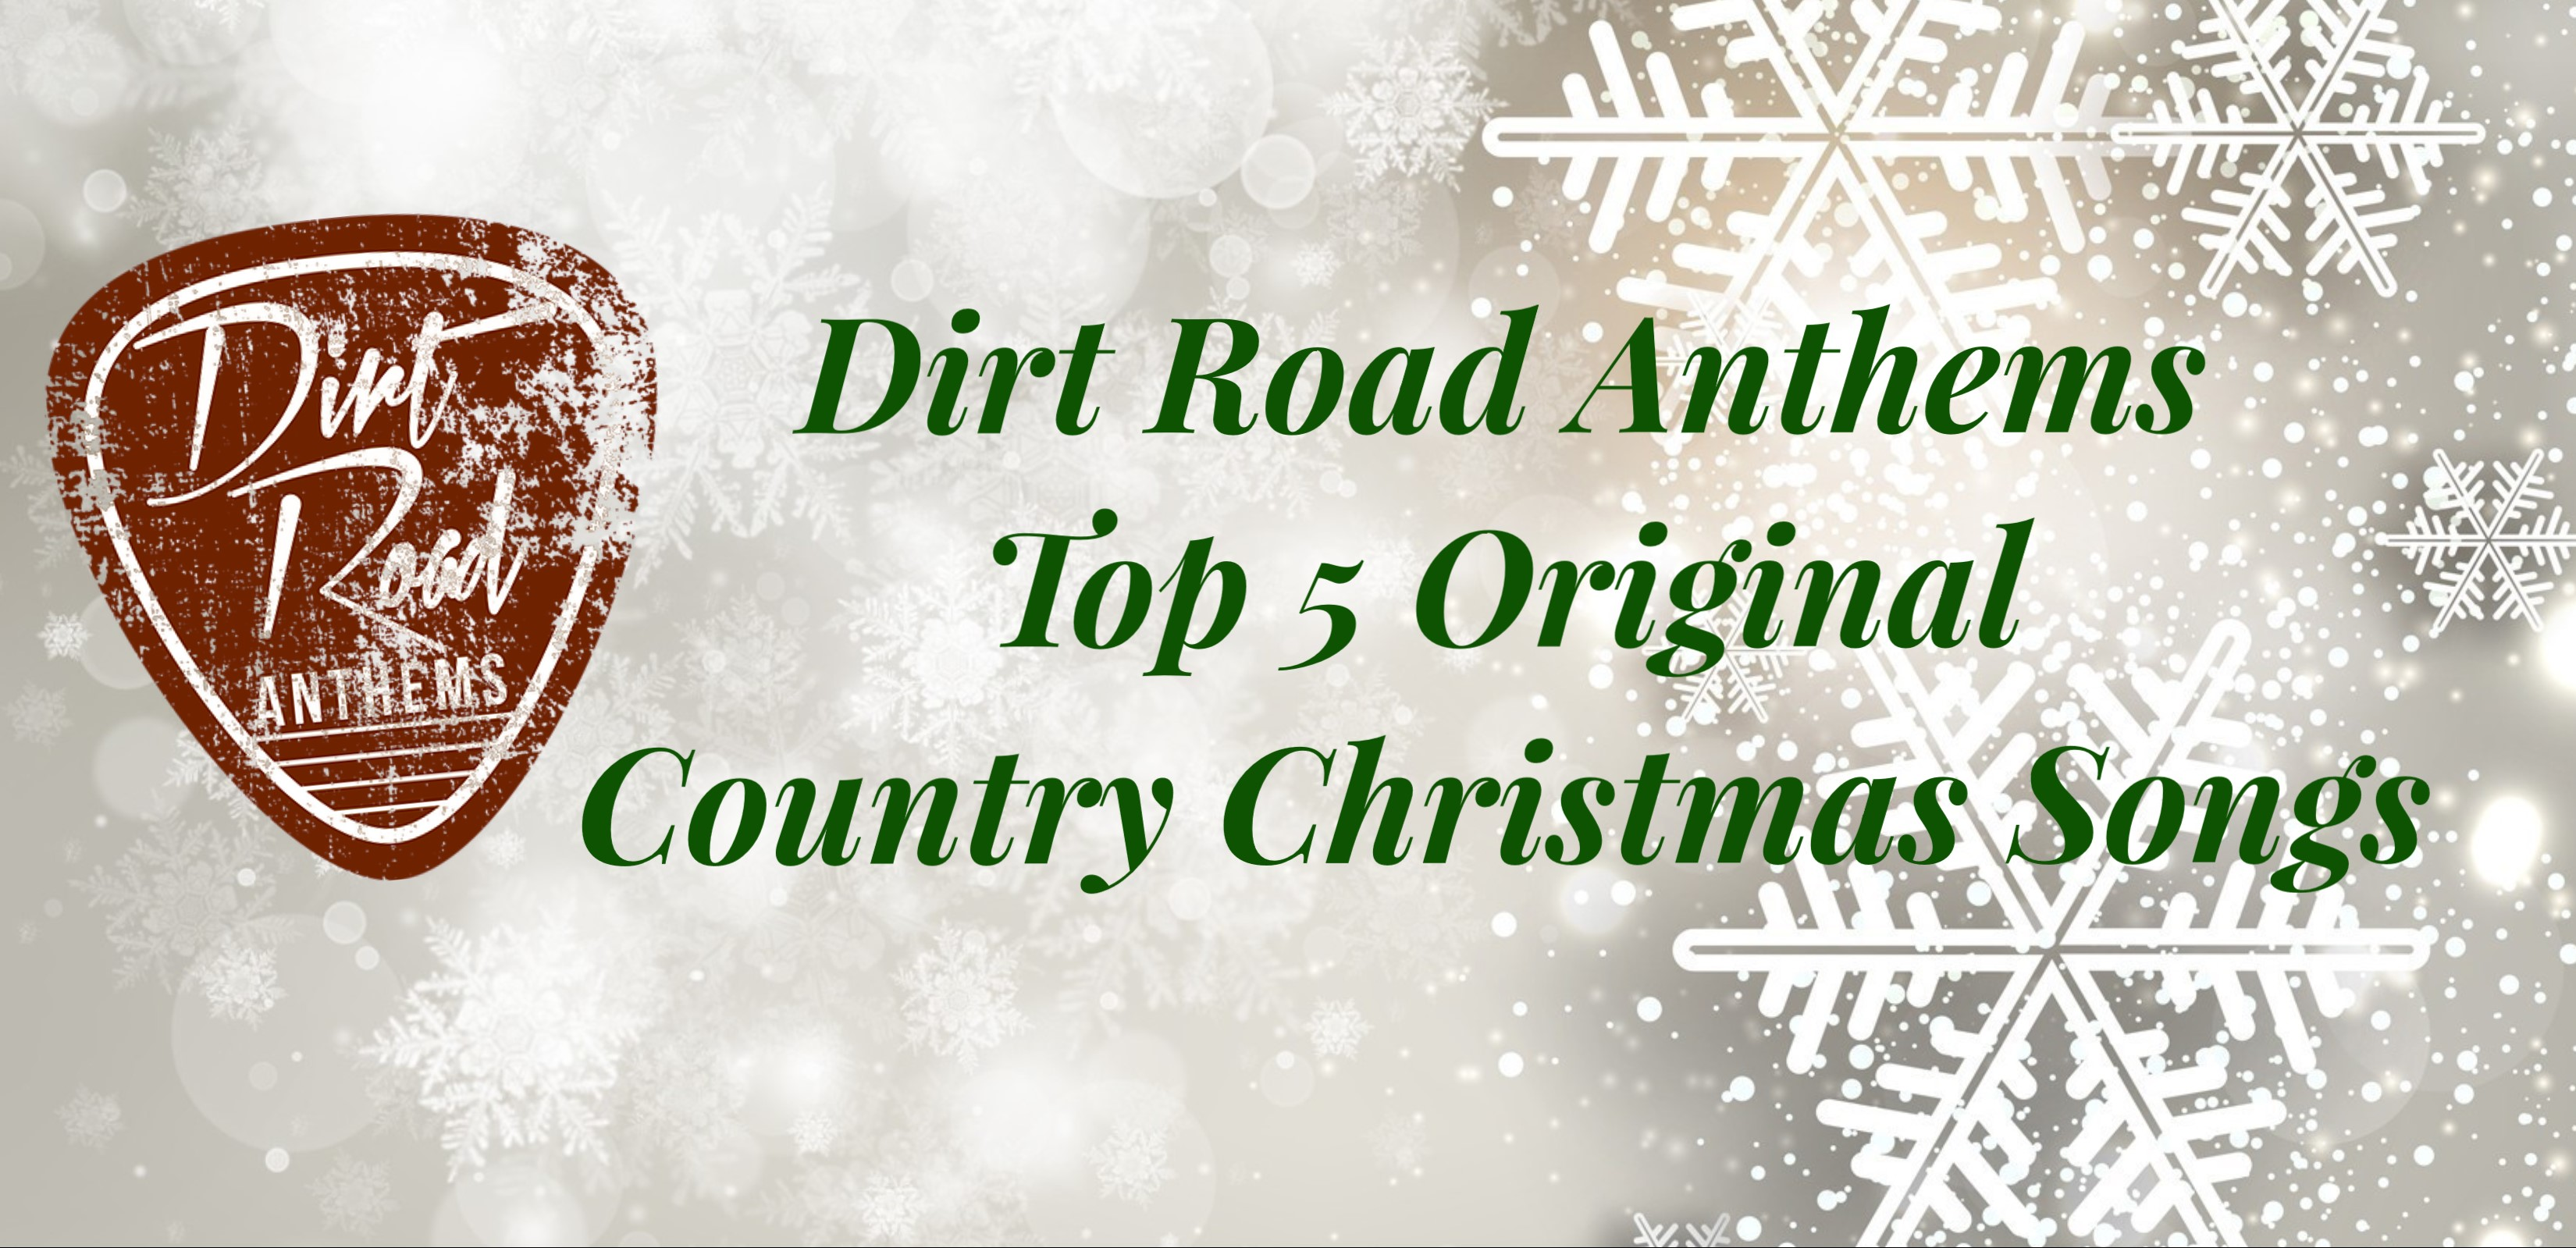 dras top 5 original country christmas songs contry music news dirt road anthems - Original Christmas Songs